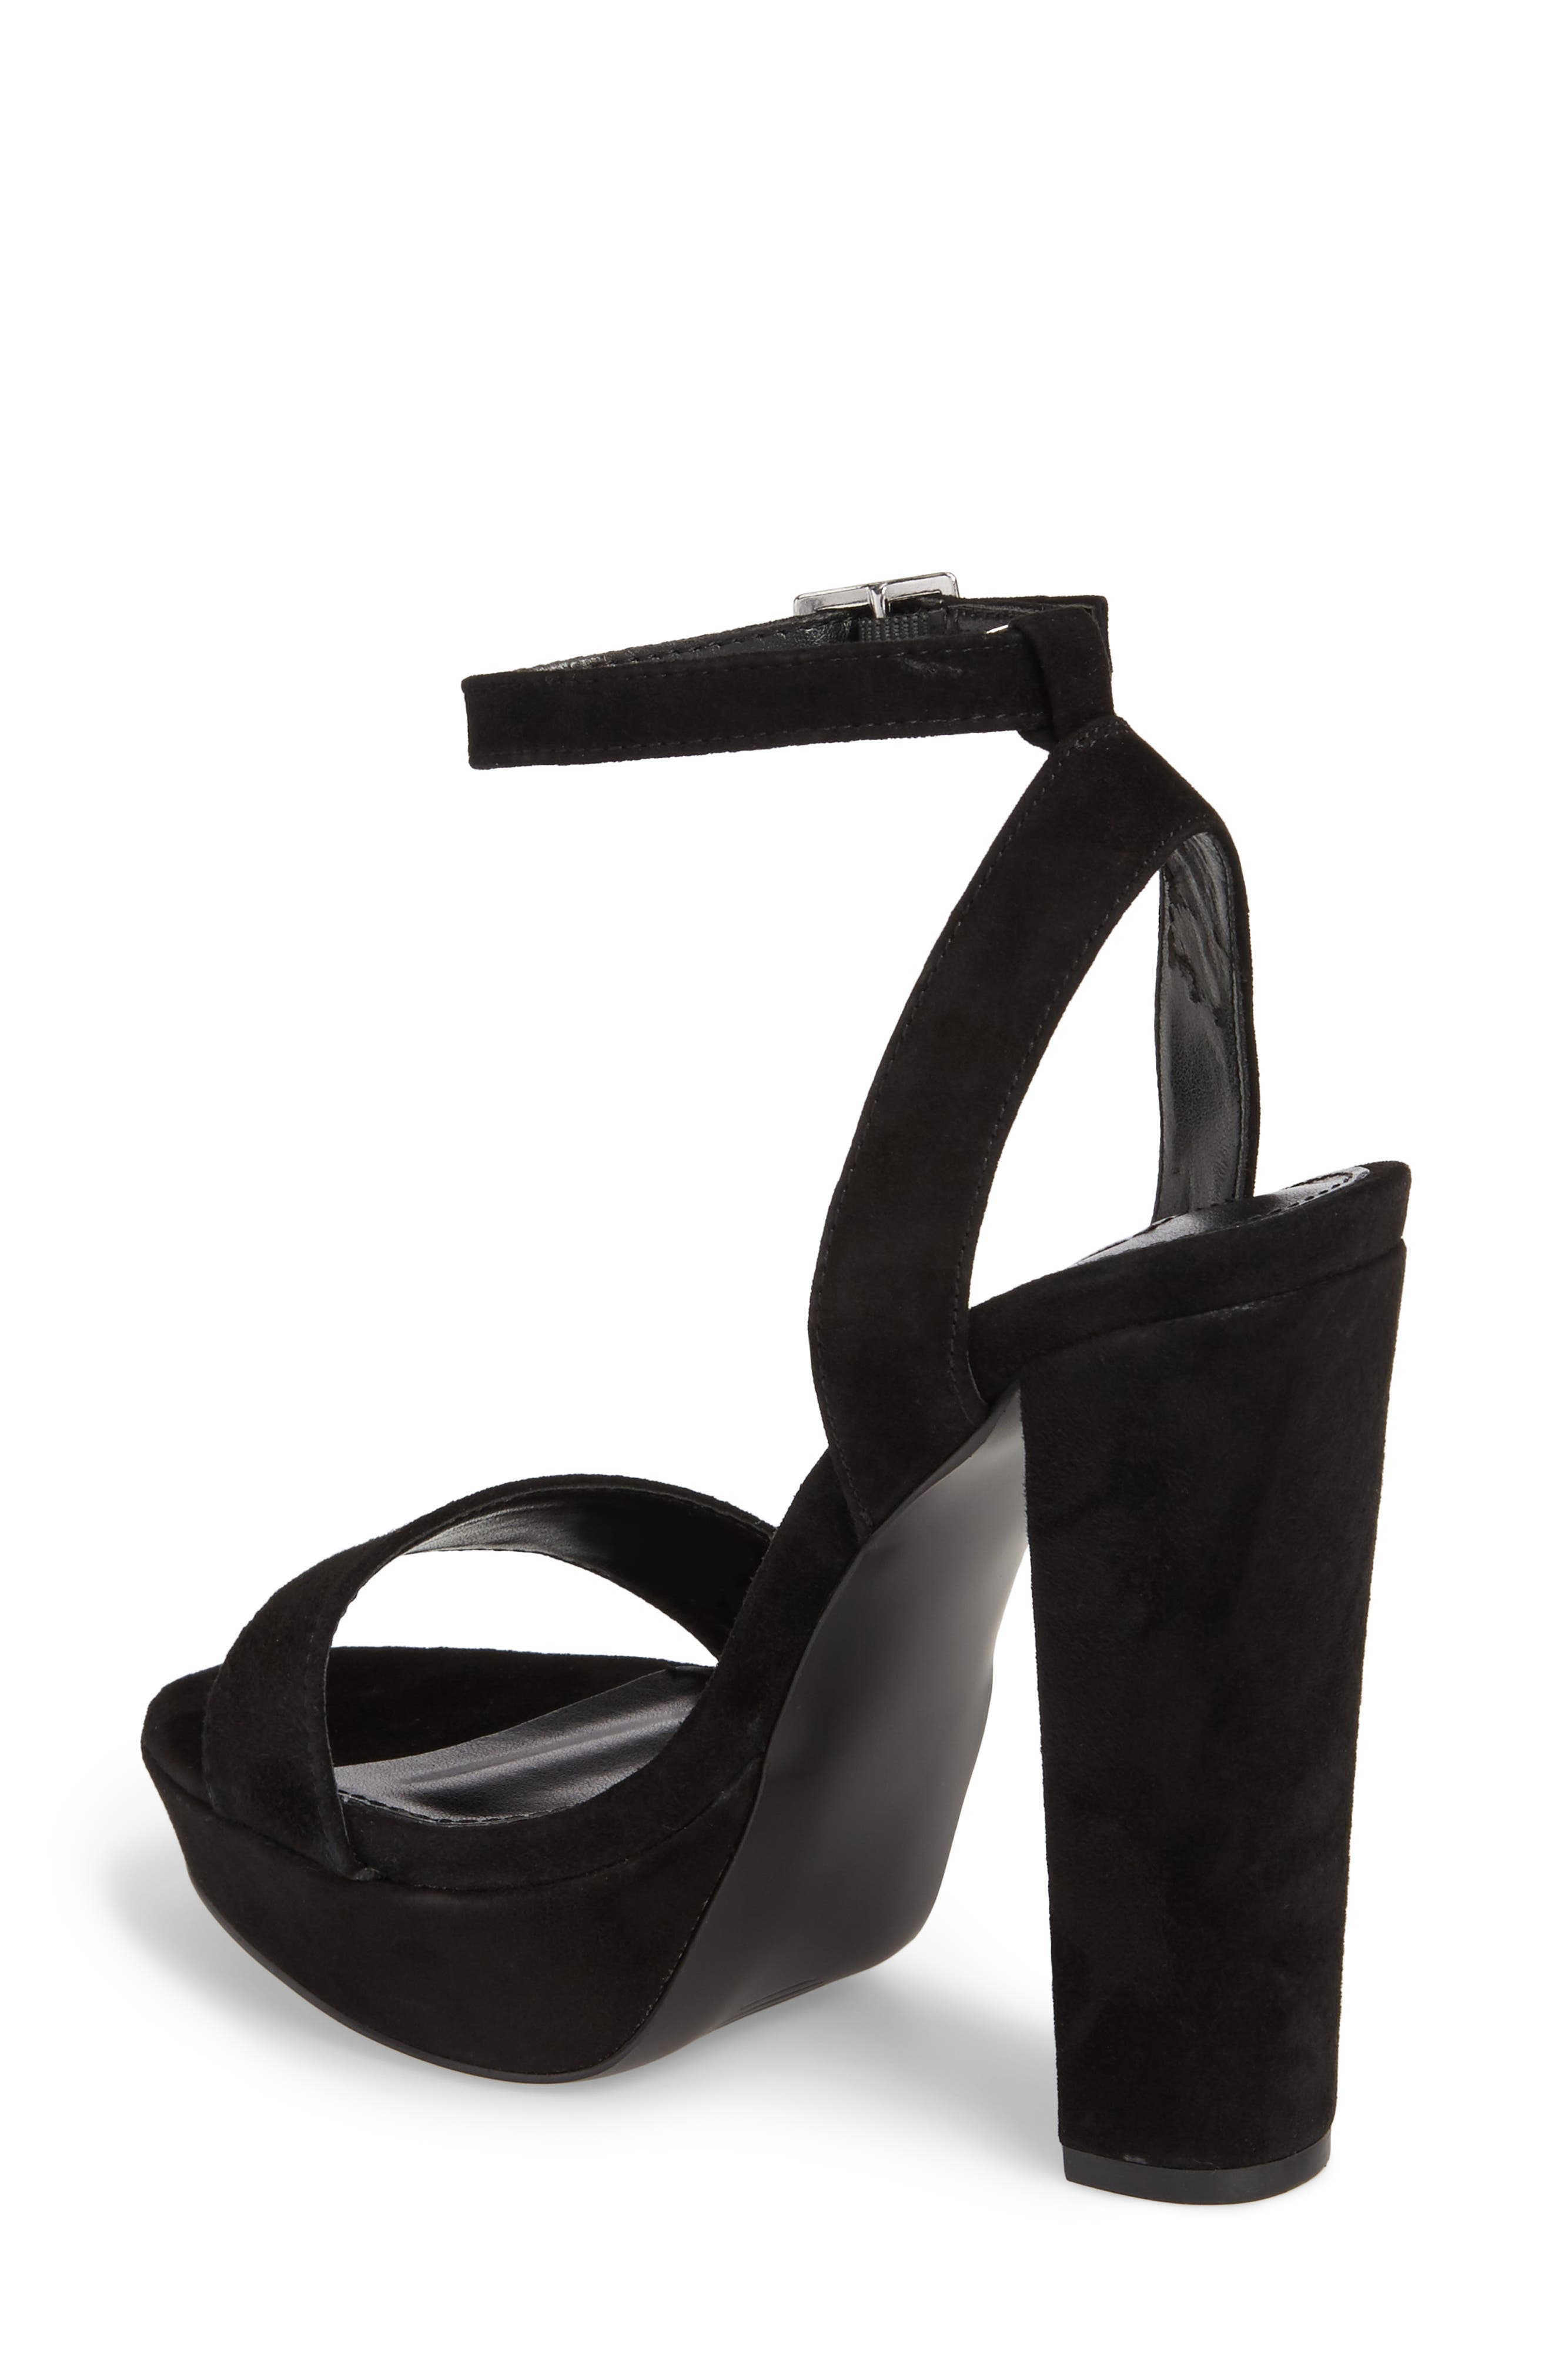 Insomnia Platform Ankle Strap Sandal,                             Alternate thumbnail 2, color,                             006